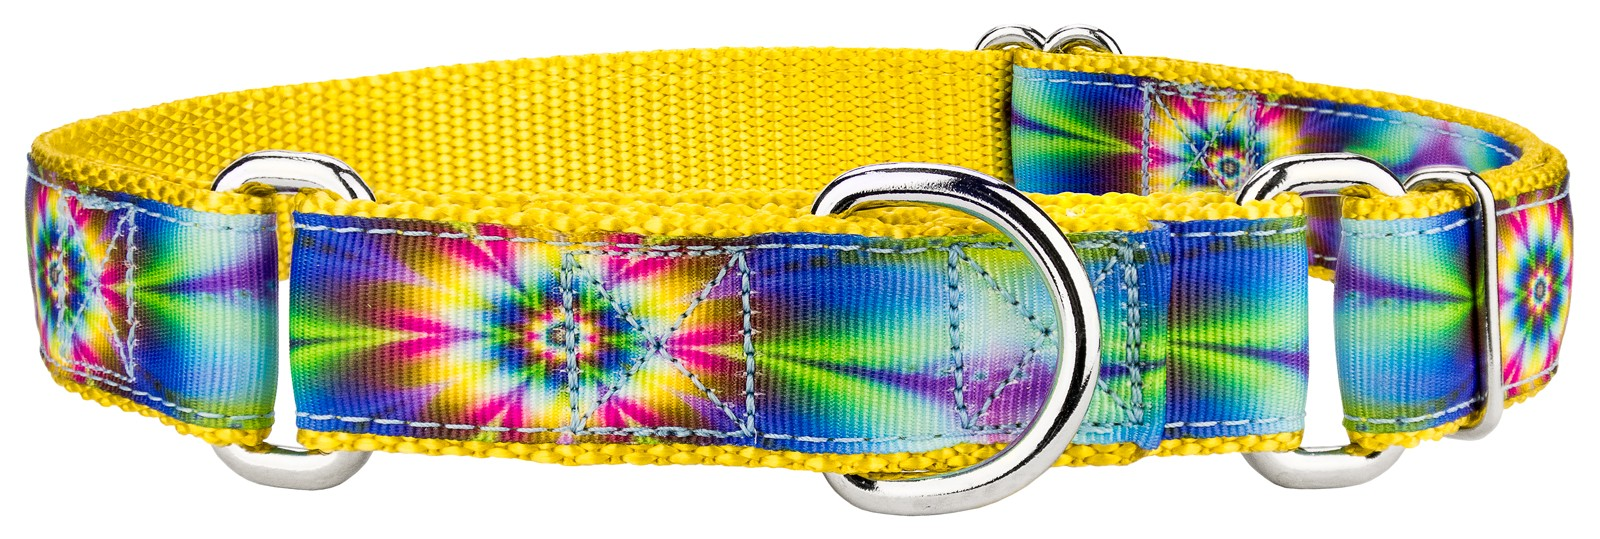 Buy tie dye flowers ribbon martingale dog collar online for Order tie dye roses online